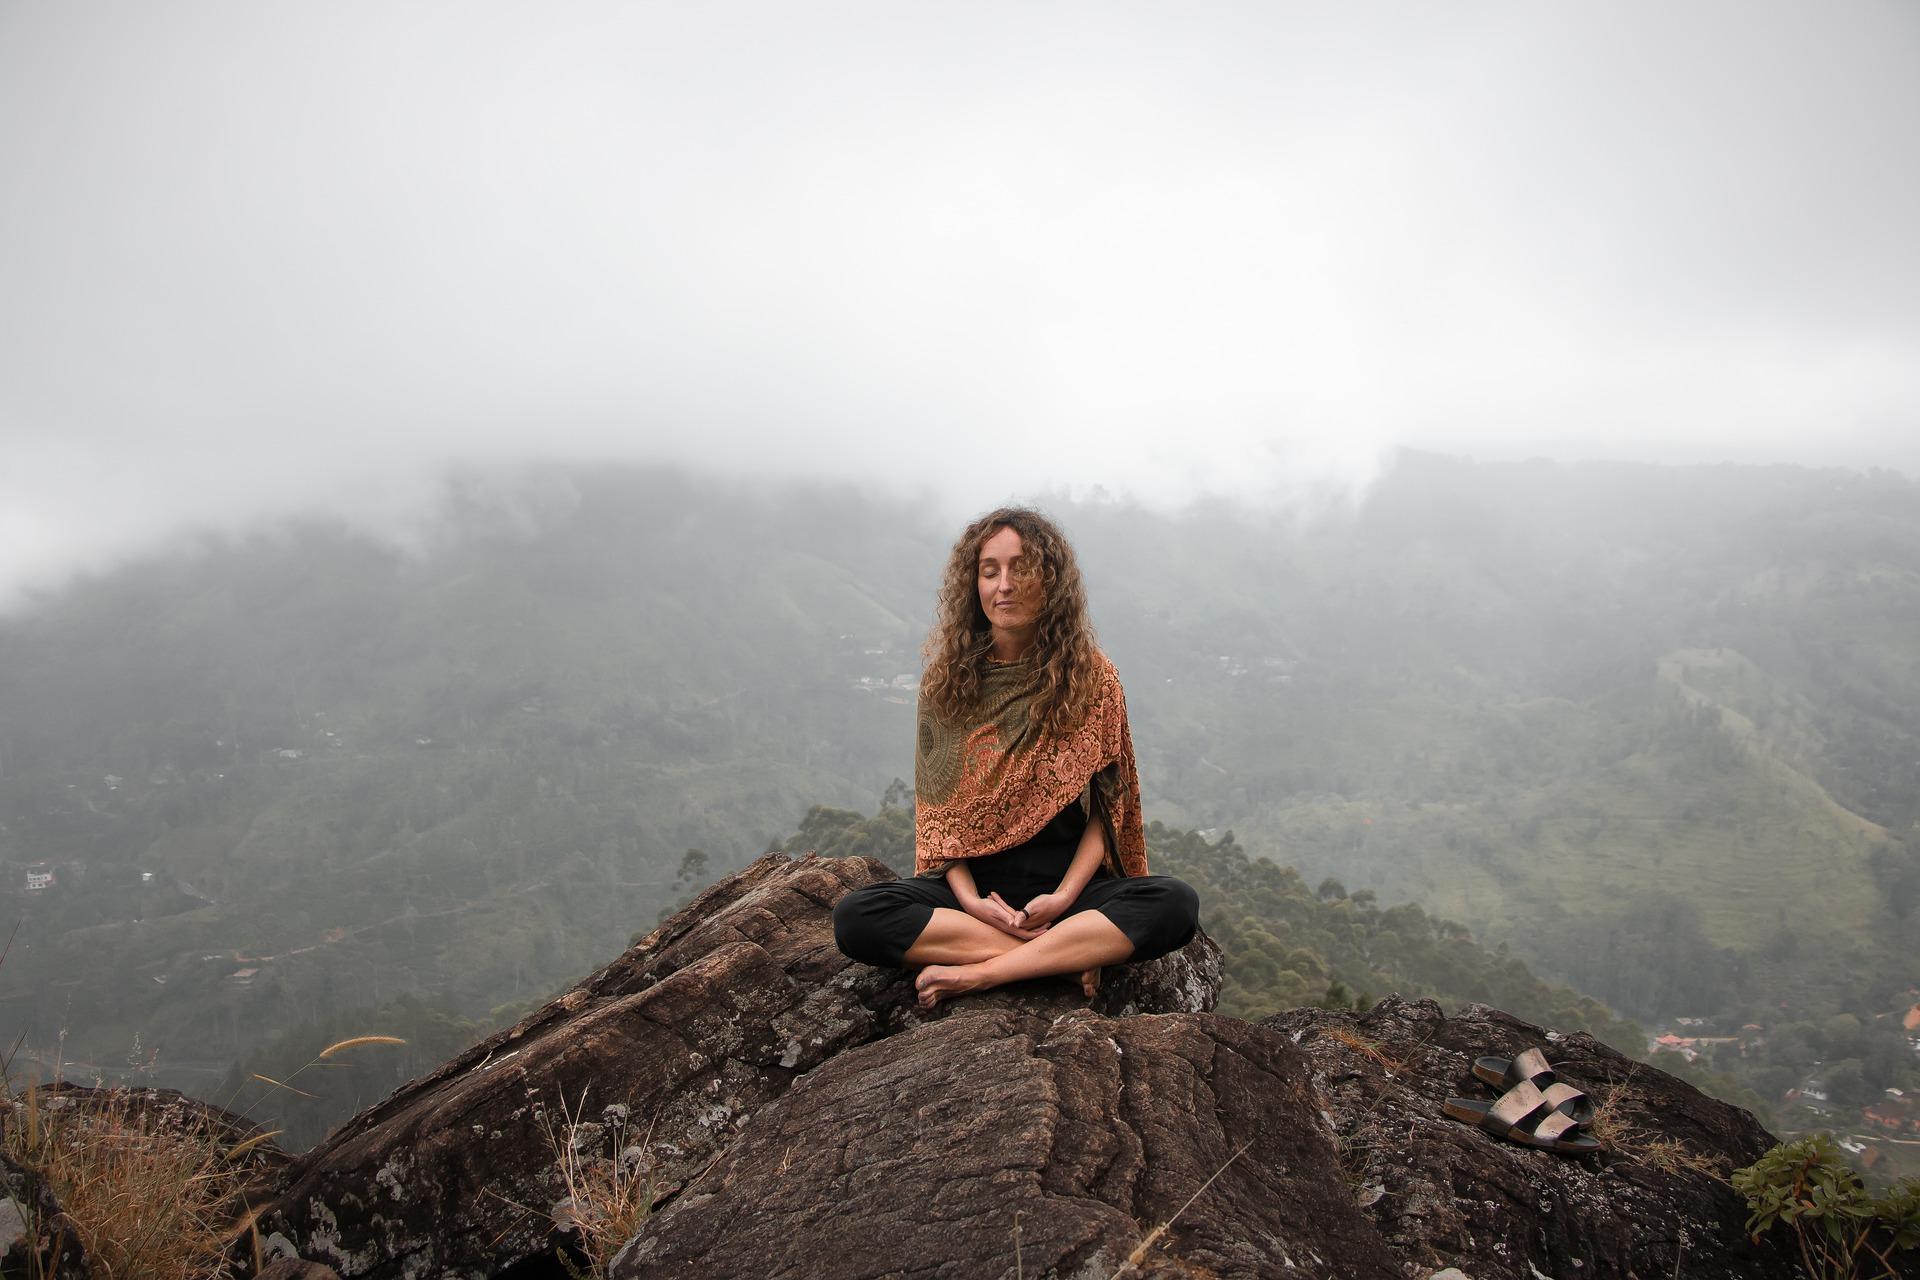 Vermoeidheid en Overgang Photocredits Bhikku Amitha via Pixabay